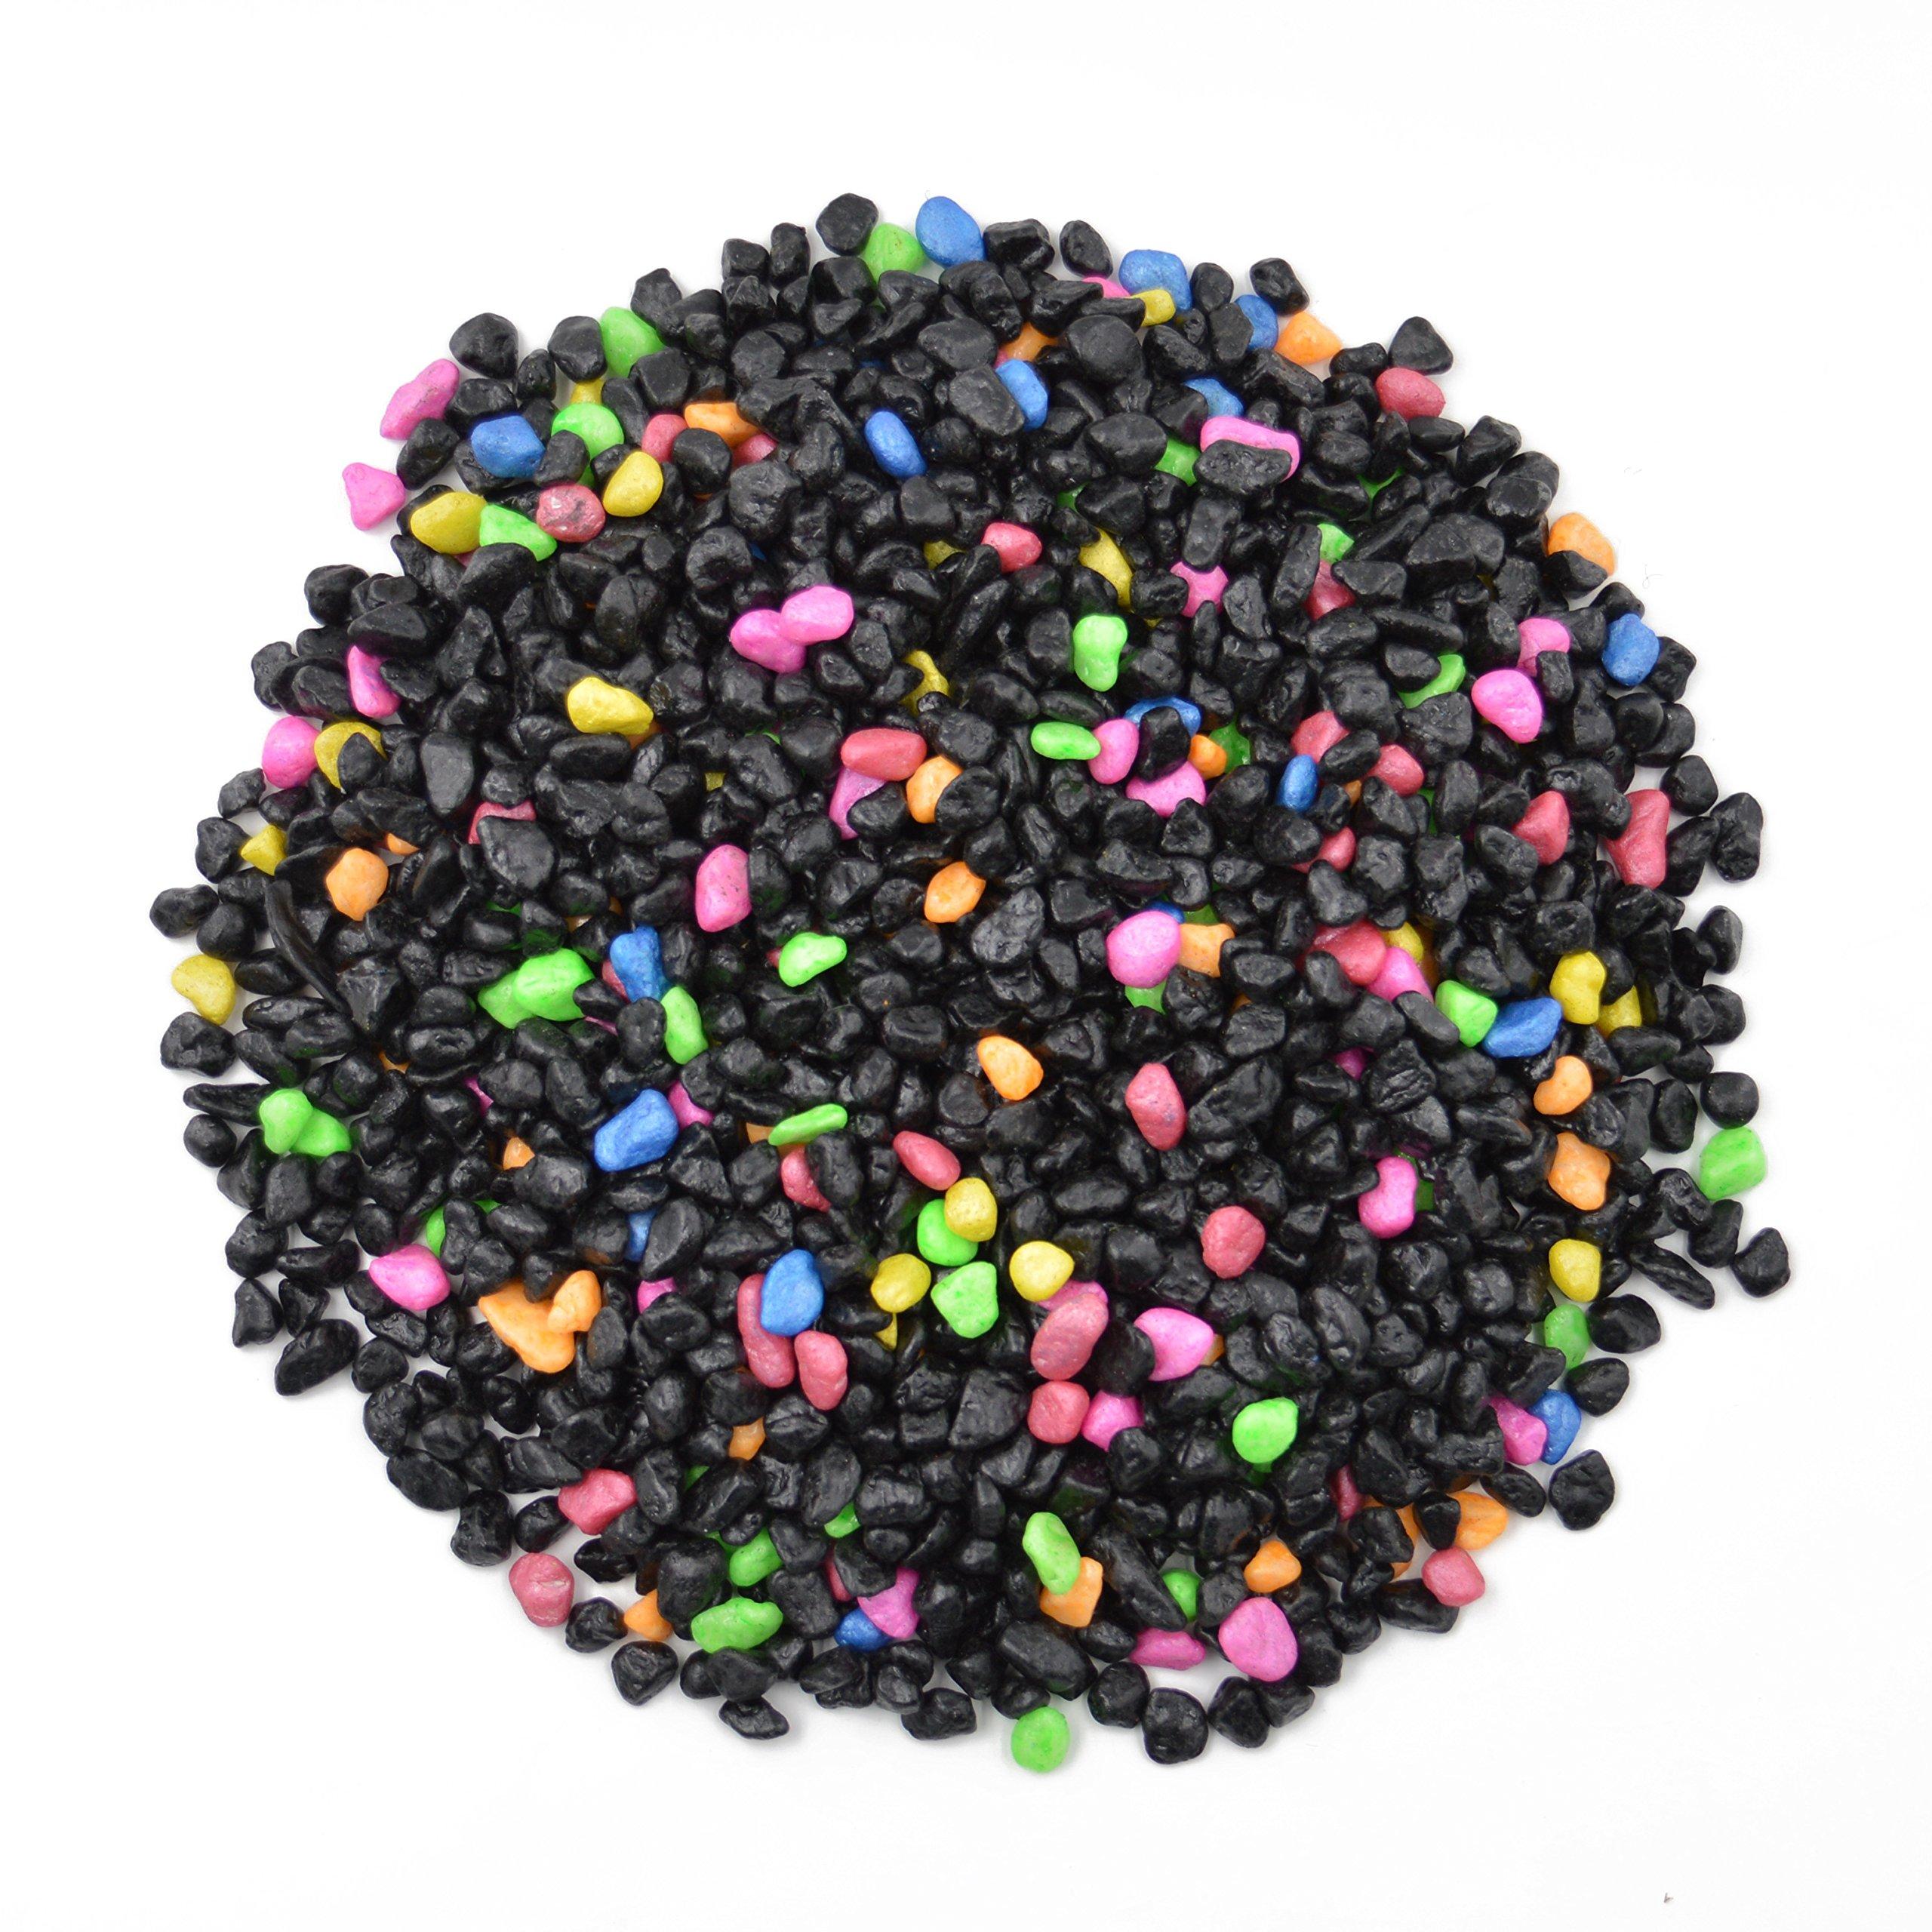 CNZ Aquarium Gravel Black & Flourescent Mix for Plant Aquariums, Landscaping, Home Decor, 0.25''-0.35'', 5-Pound by CNZ